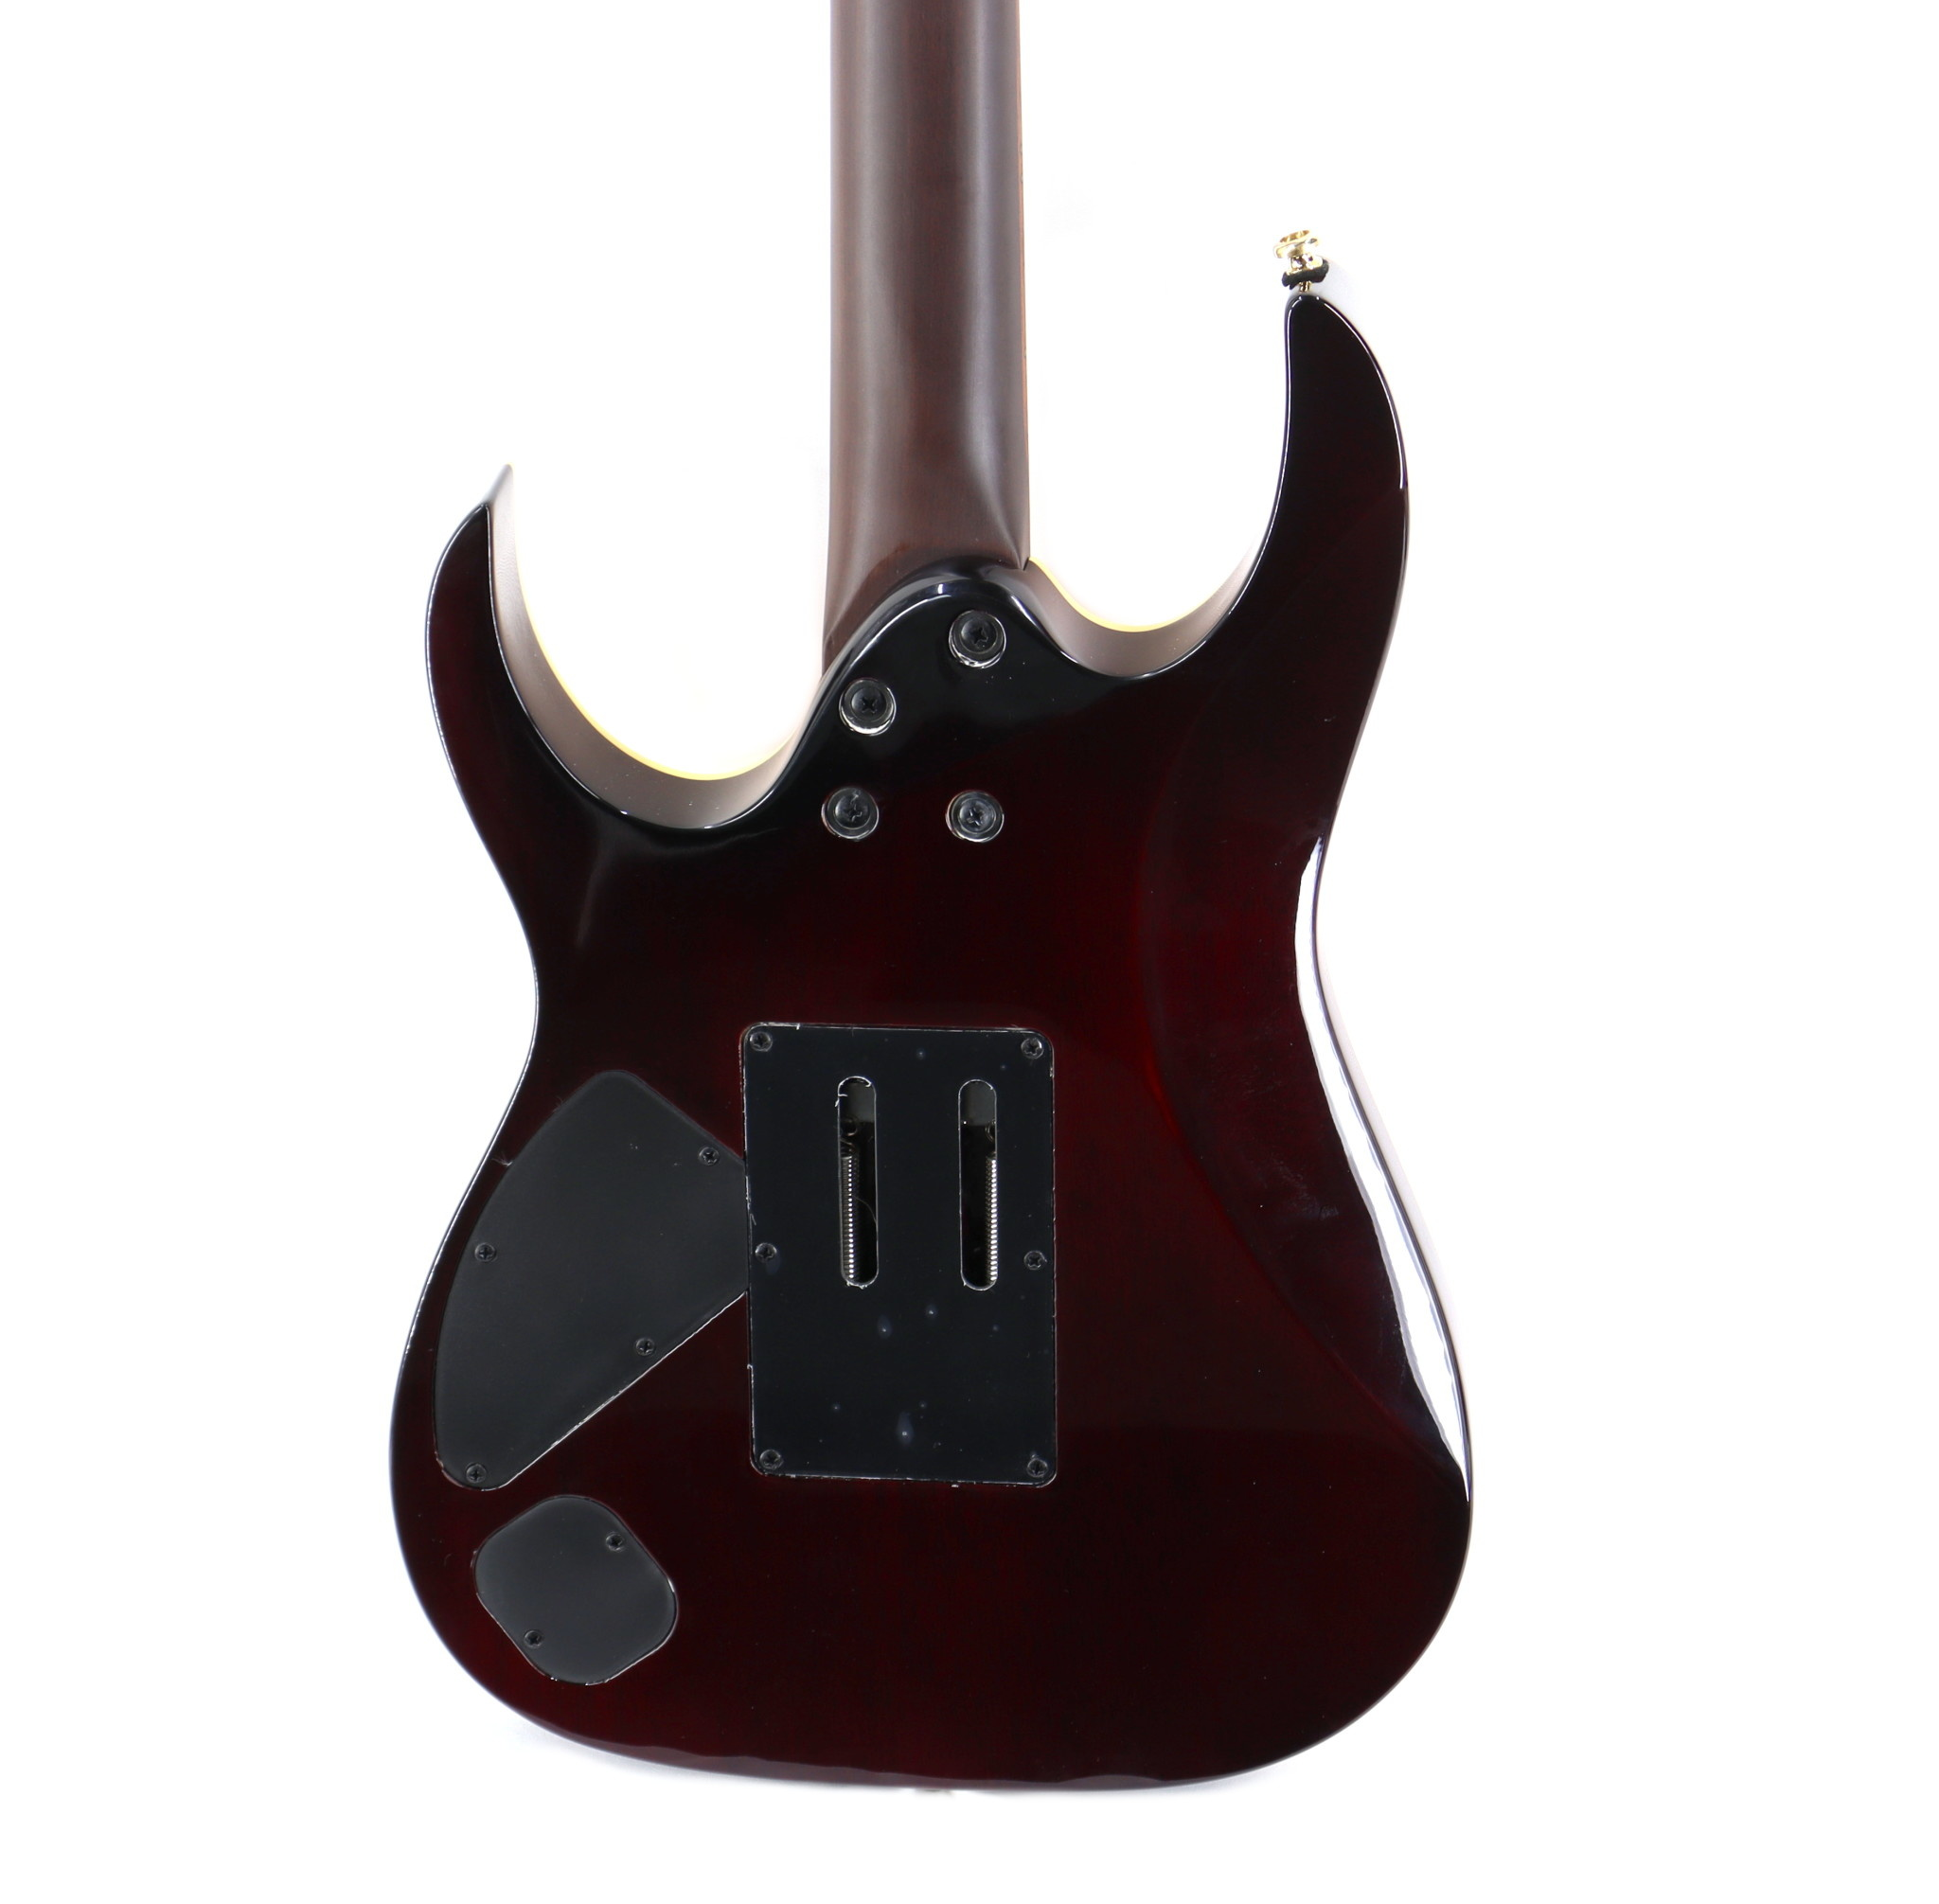 Ibanez Ibanez RG High Performance 6str Electric Guitar - Autumn Leaf Gradation